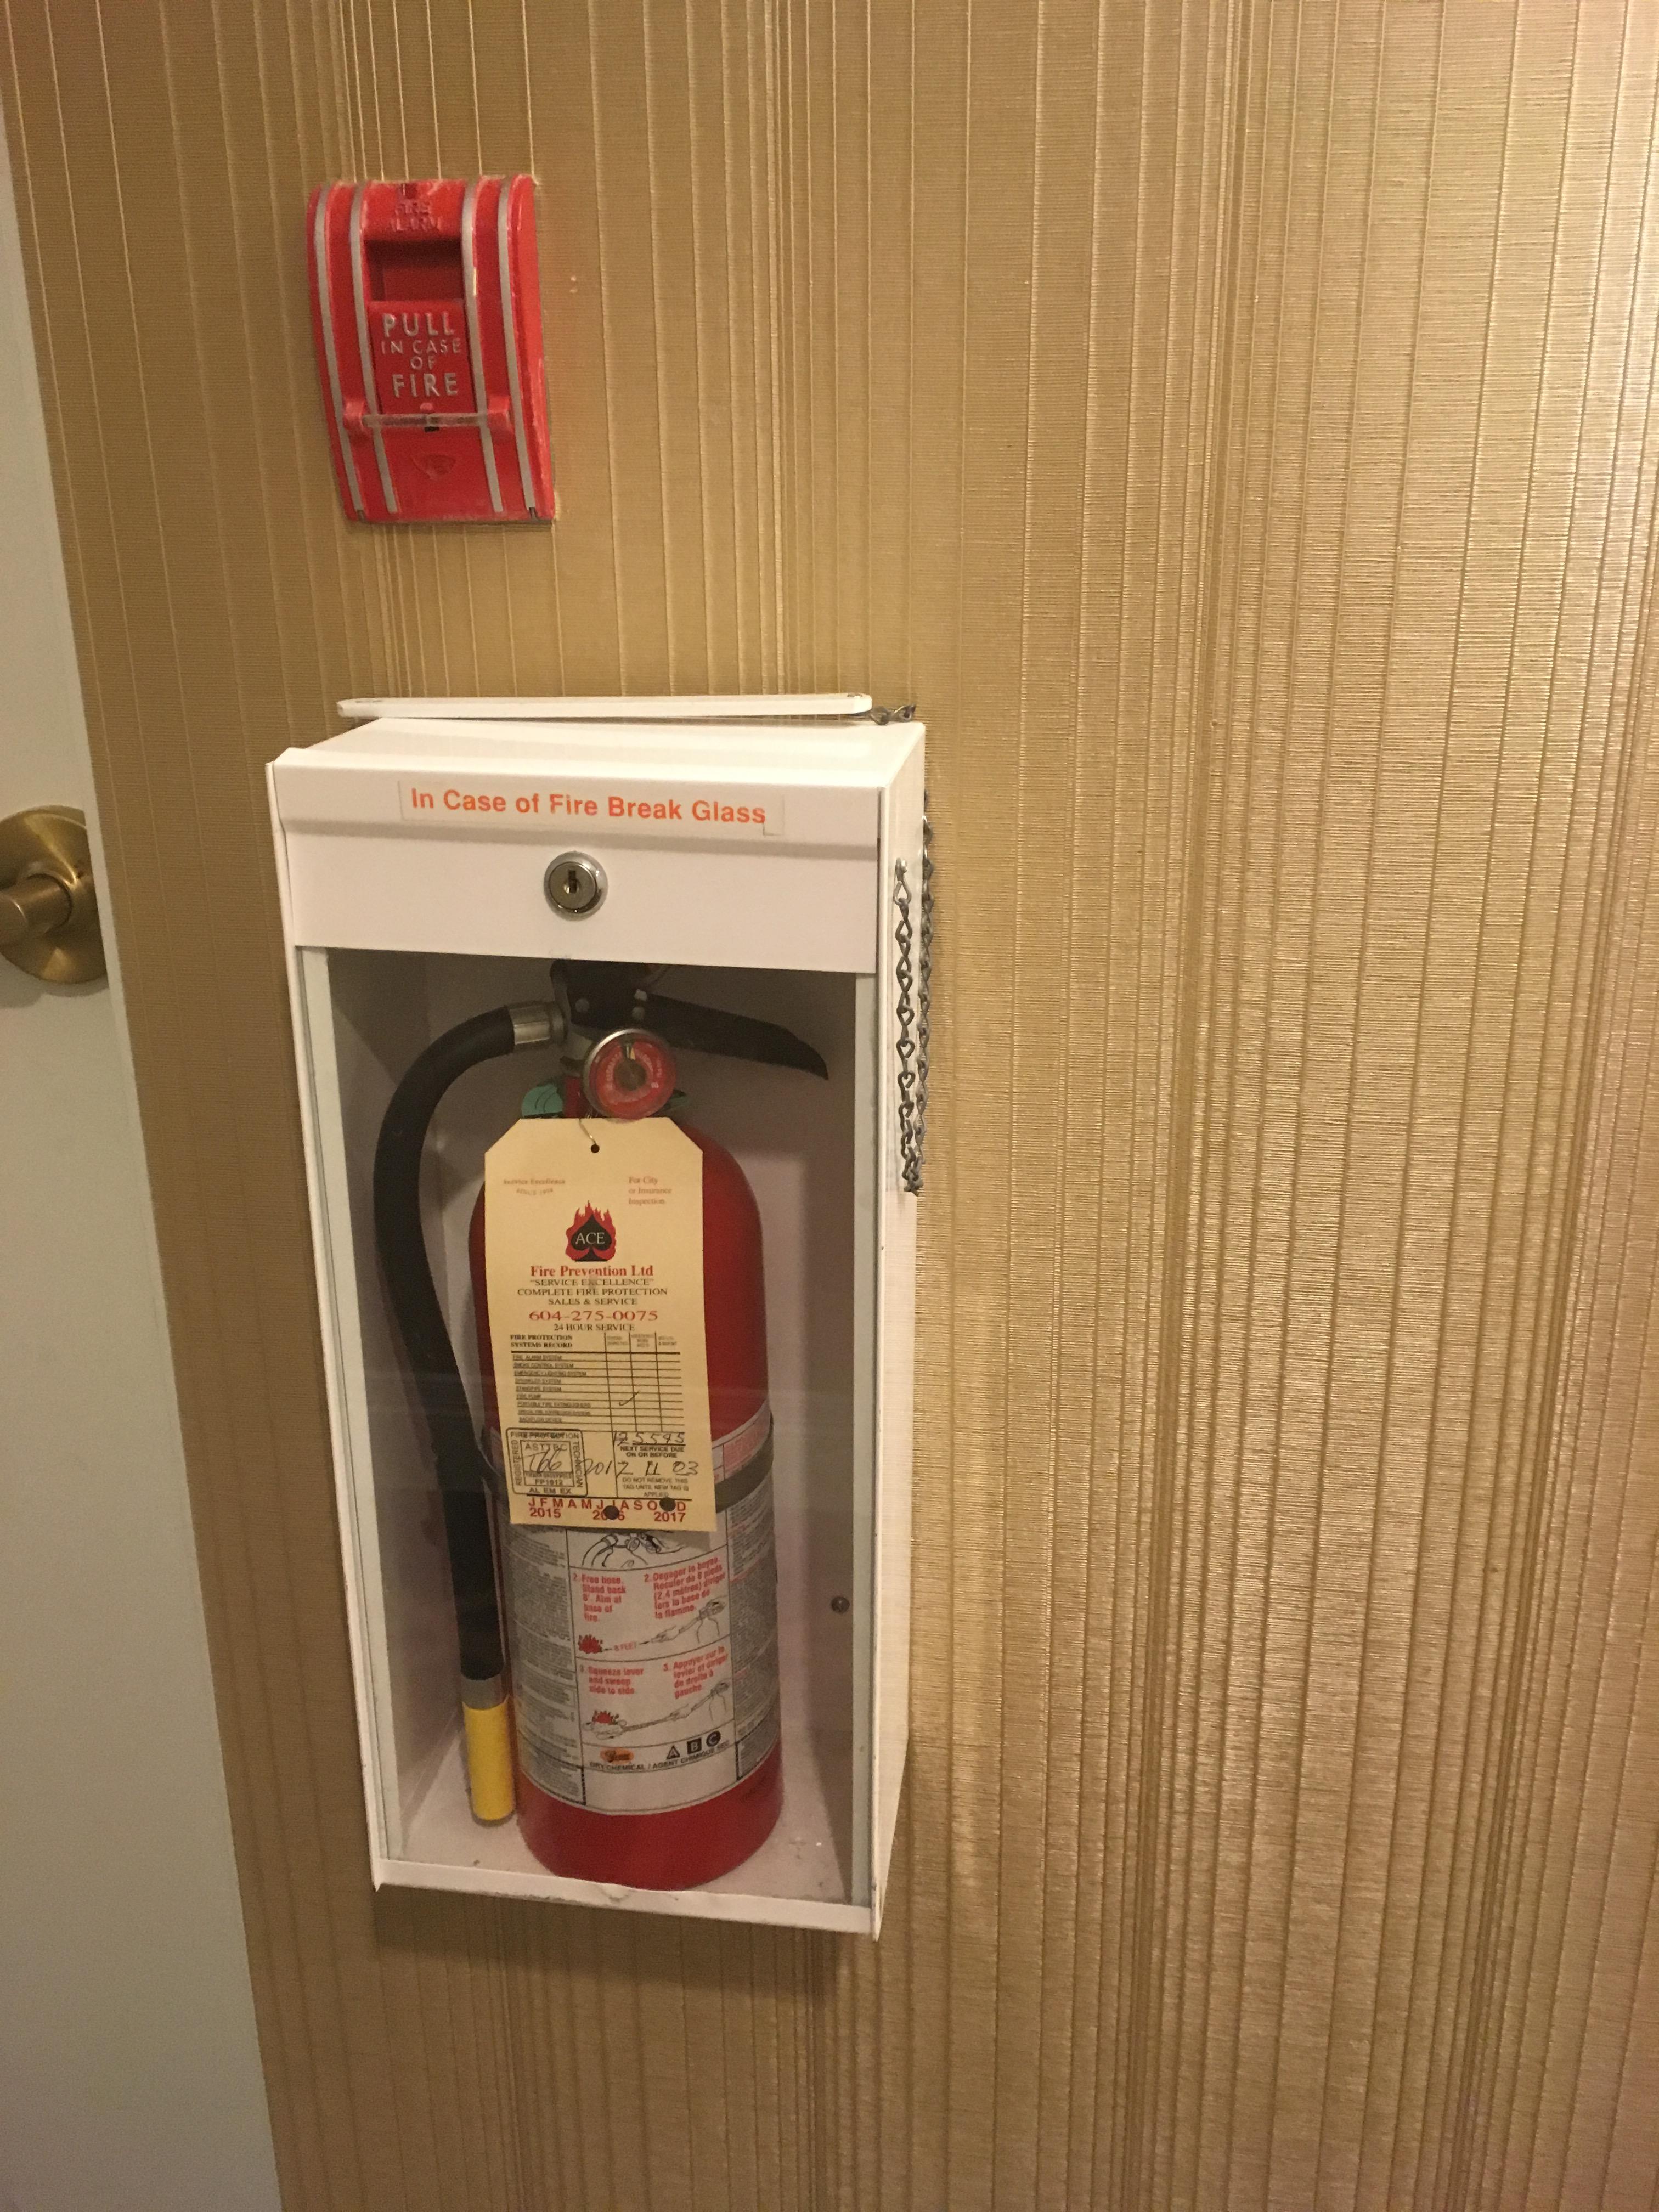 vancouver hilton fire extinguisher, fire extinguisher glass case, extinguisher glass casket